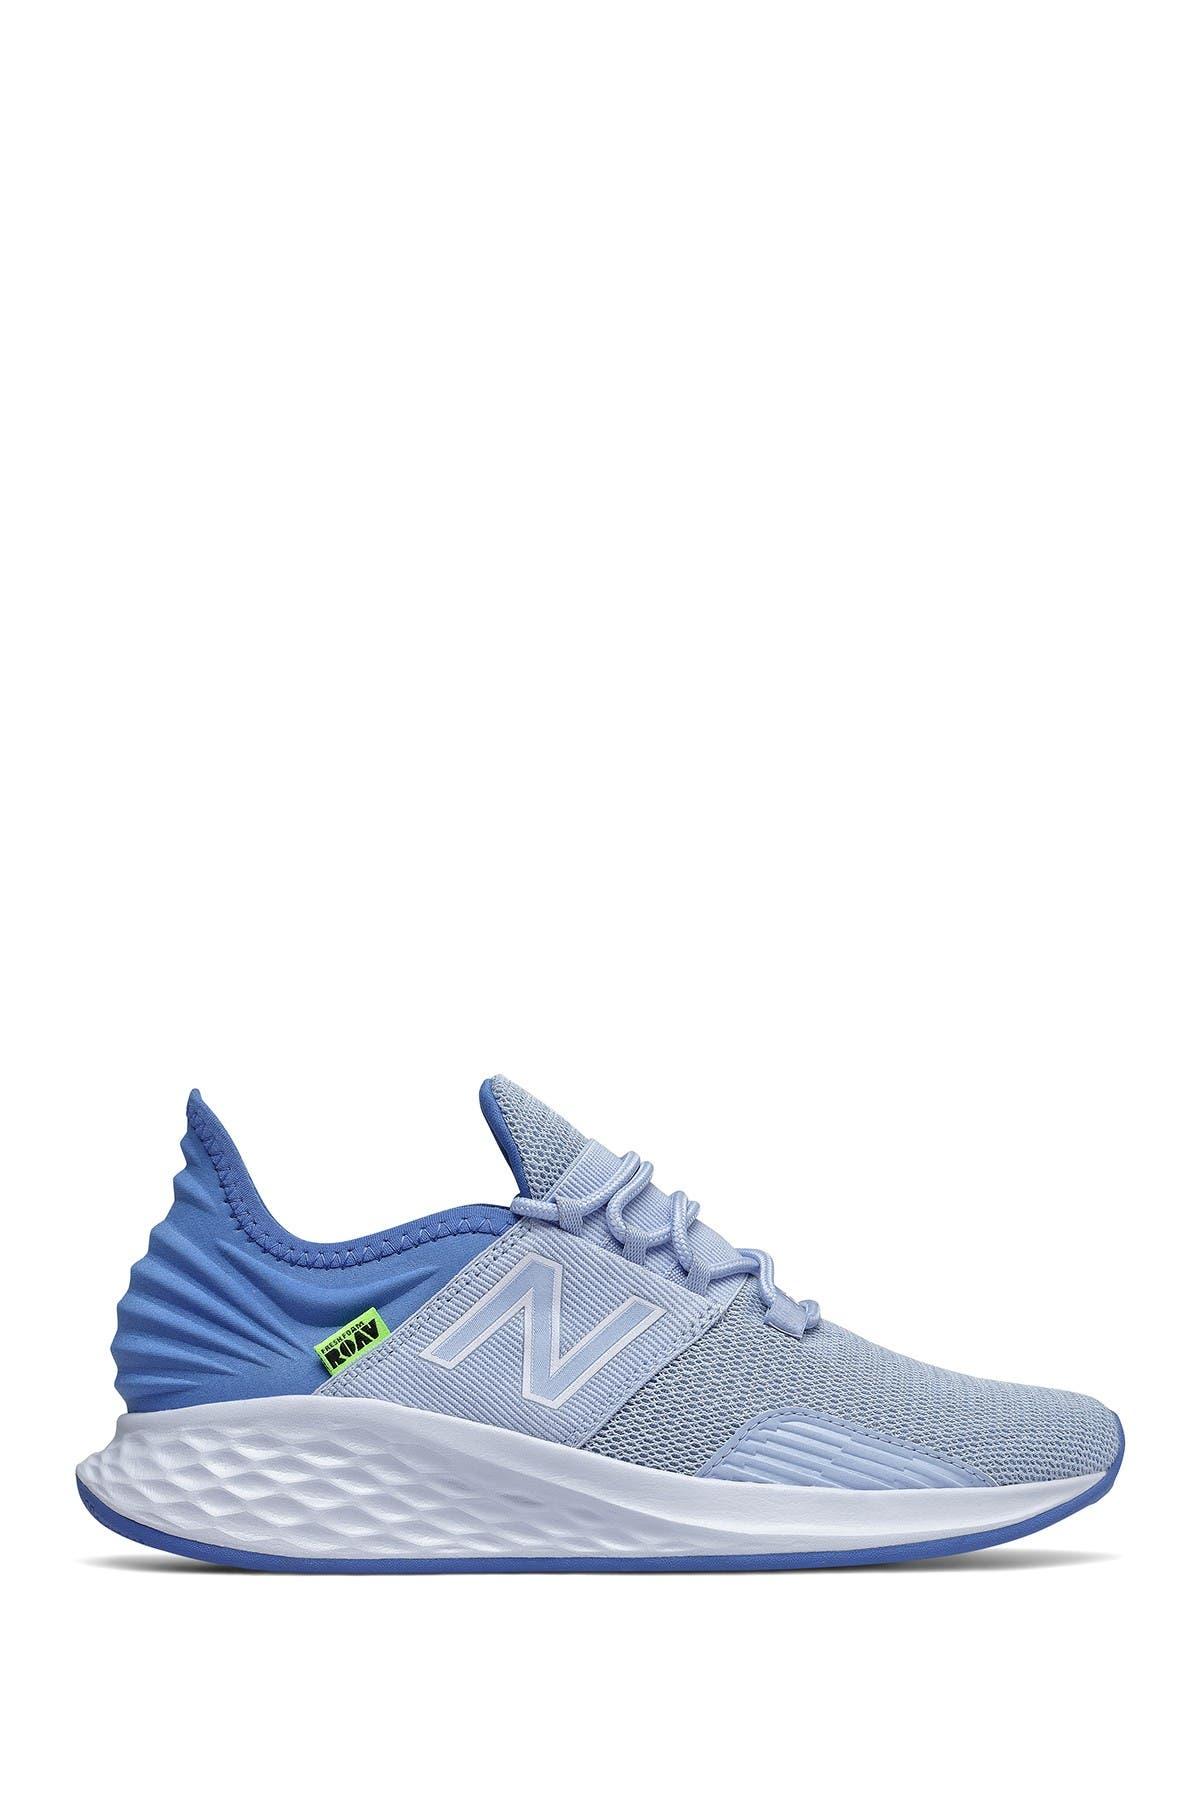 Image of New Balance Fresh Foam Roav Running Sneaker - Wide Width Available